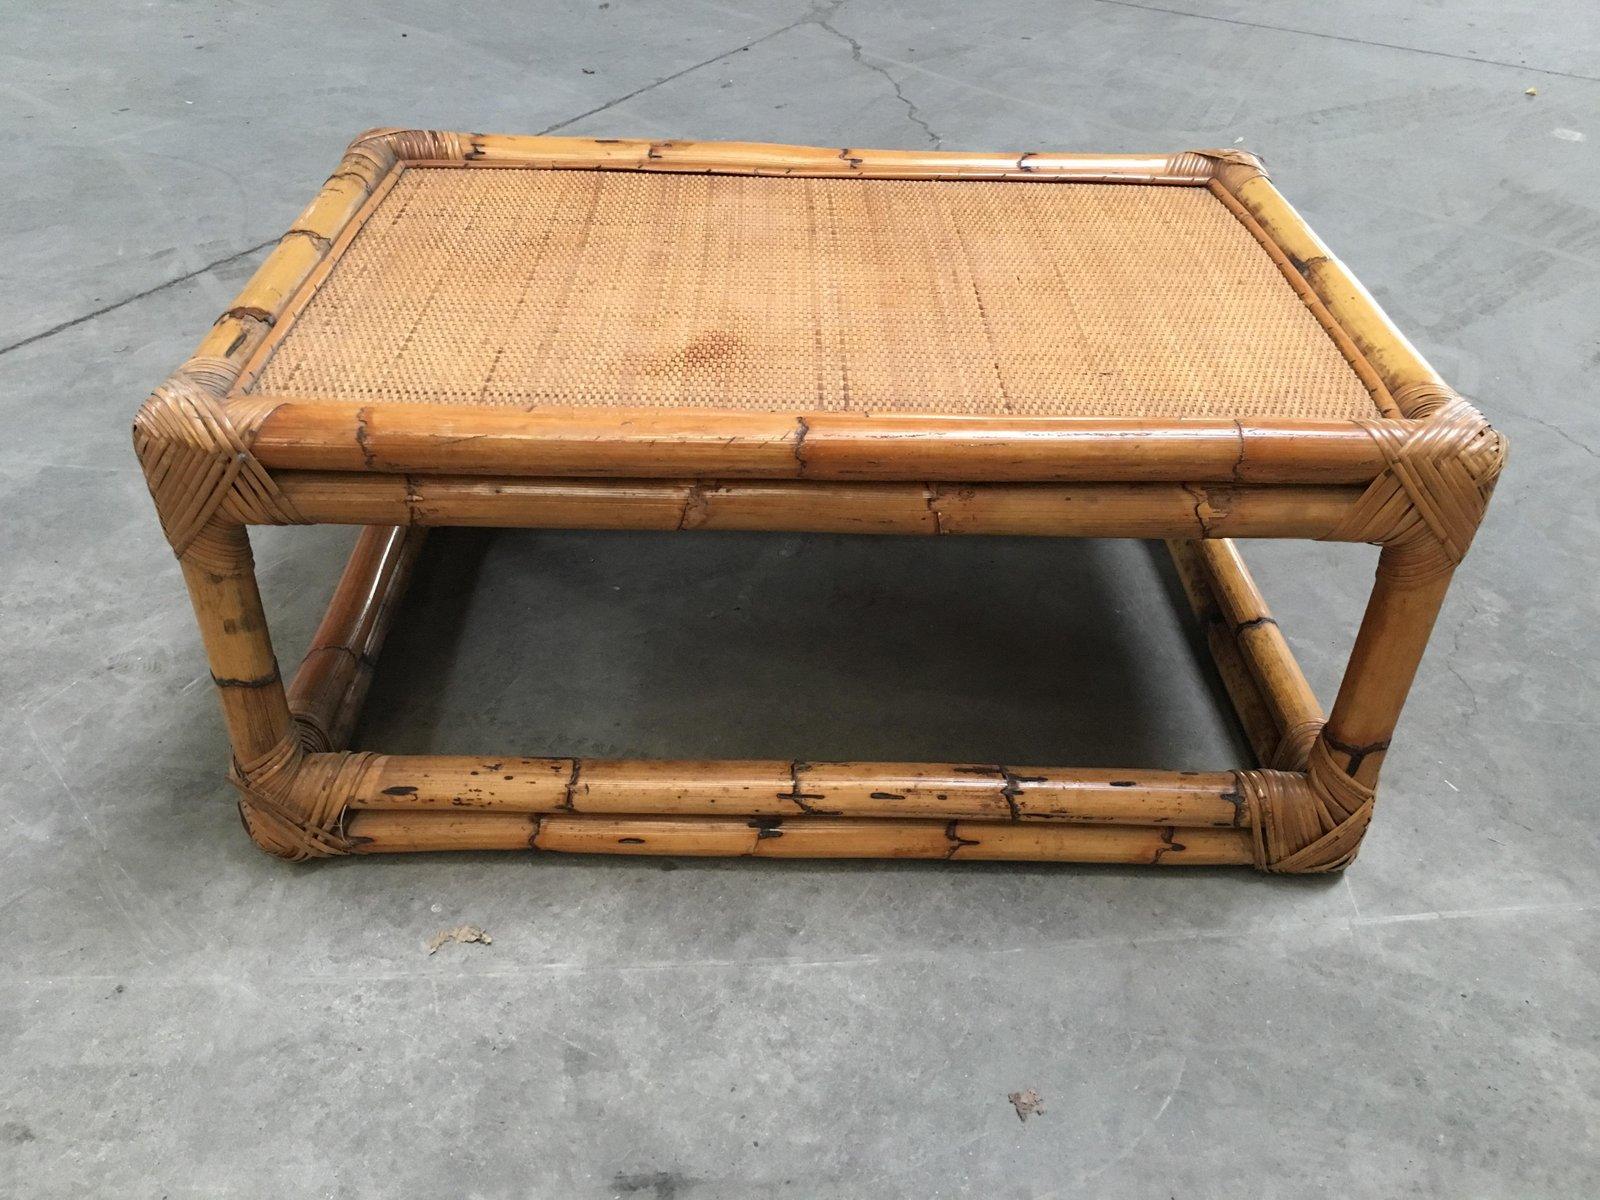 Vintage Italian Bamboo Coffee Table